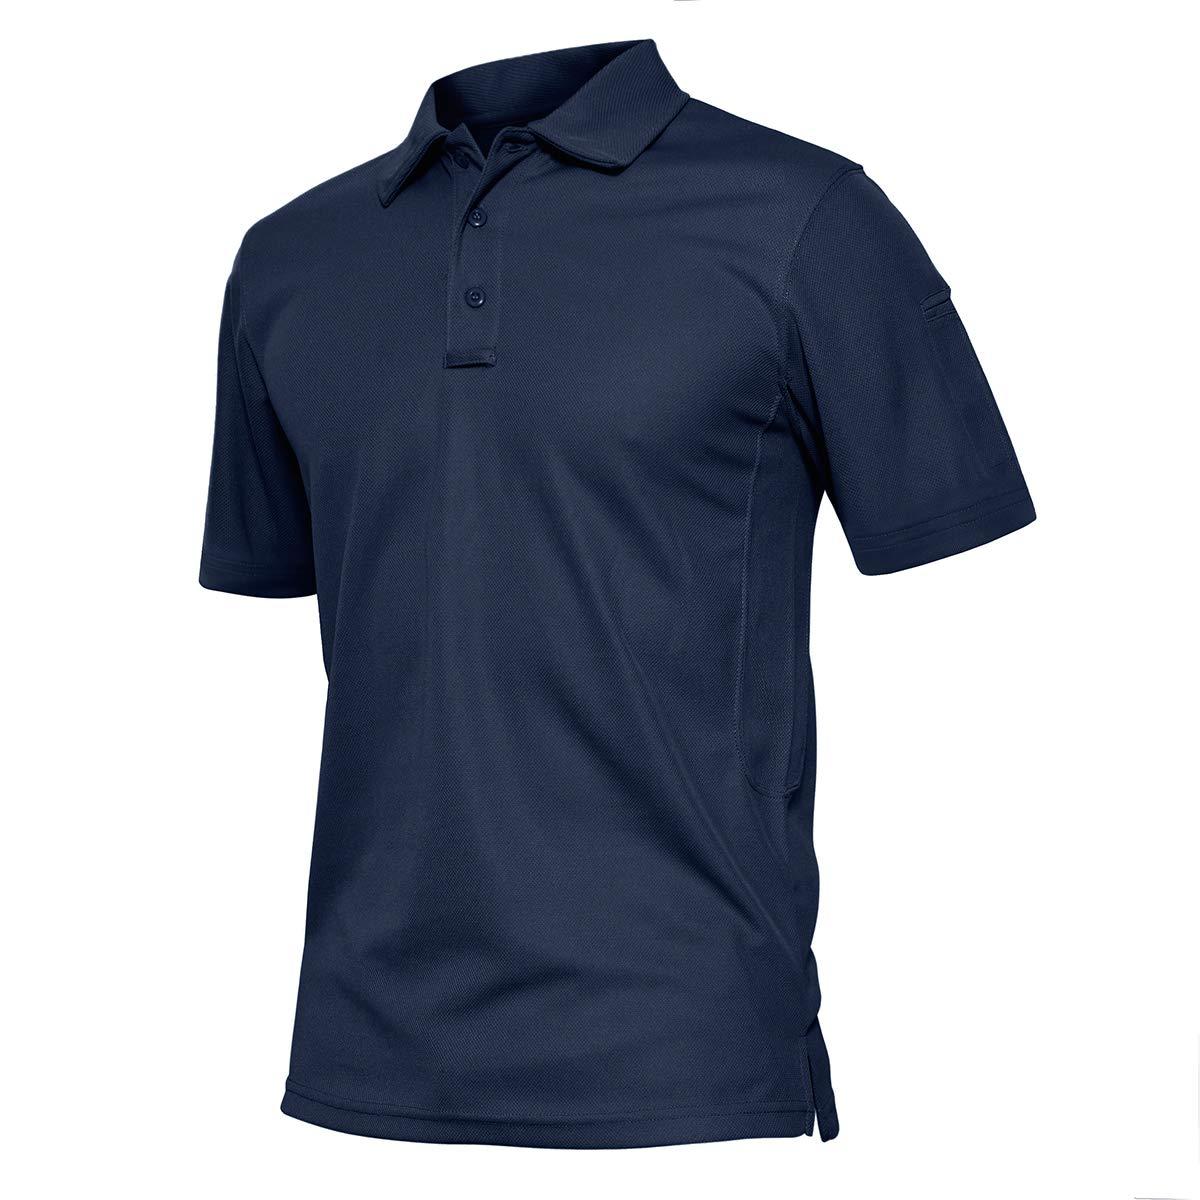 TACVASEN Men's Outdoor Sport Performance Polo Long and Short Sleeve Shirt Tactical Top Tee Shirt